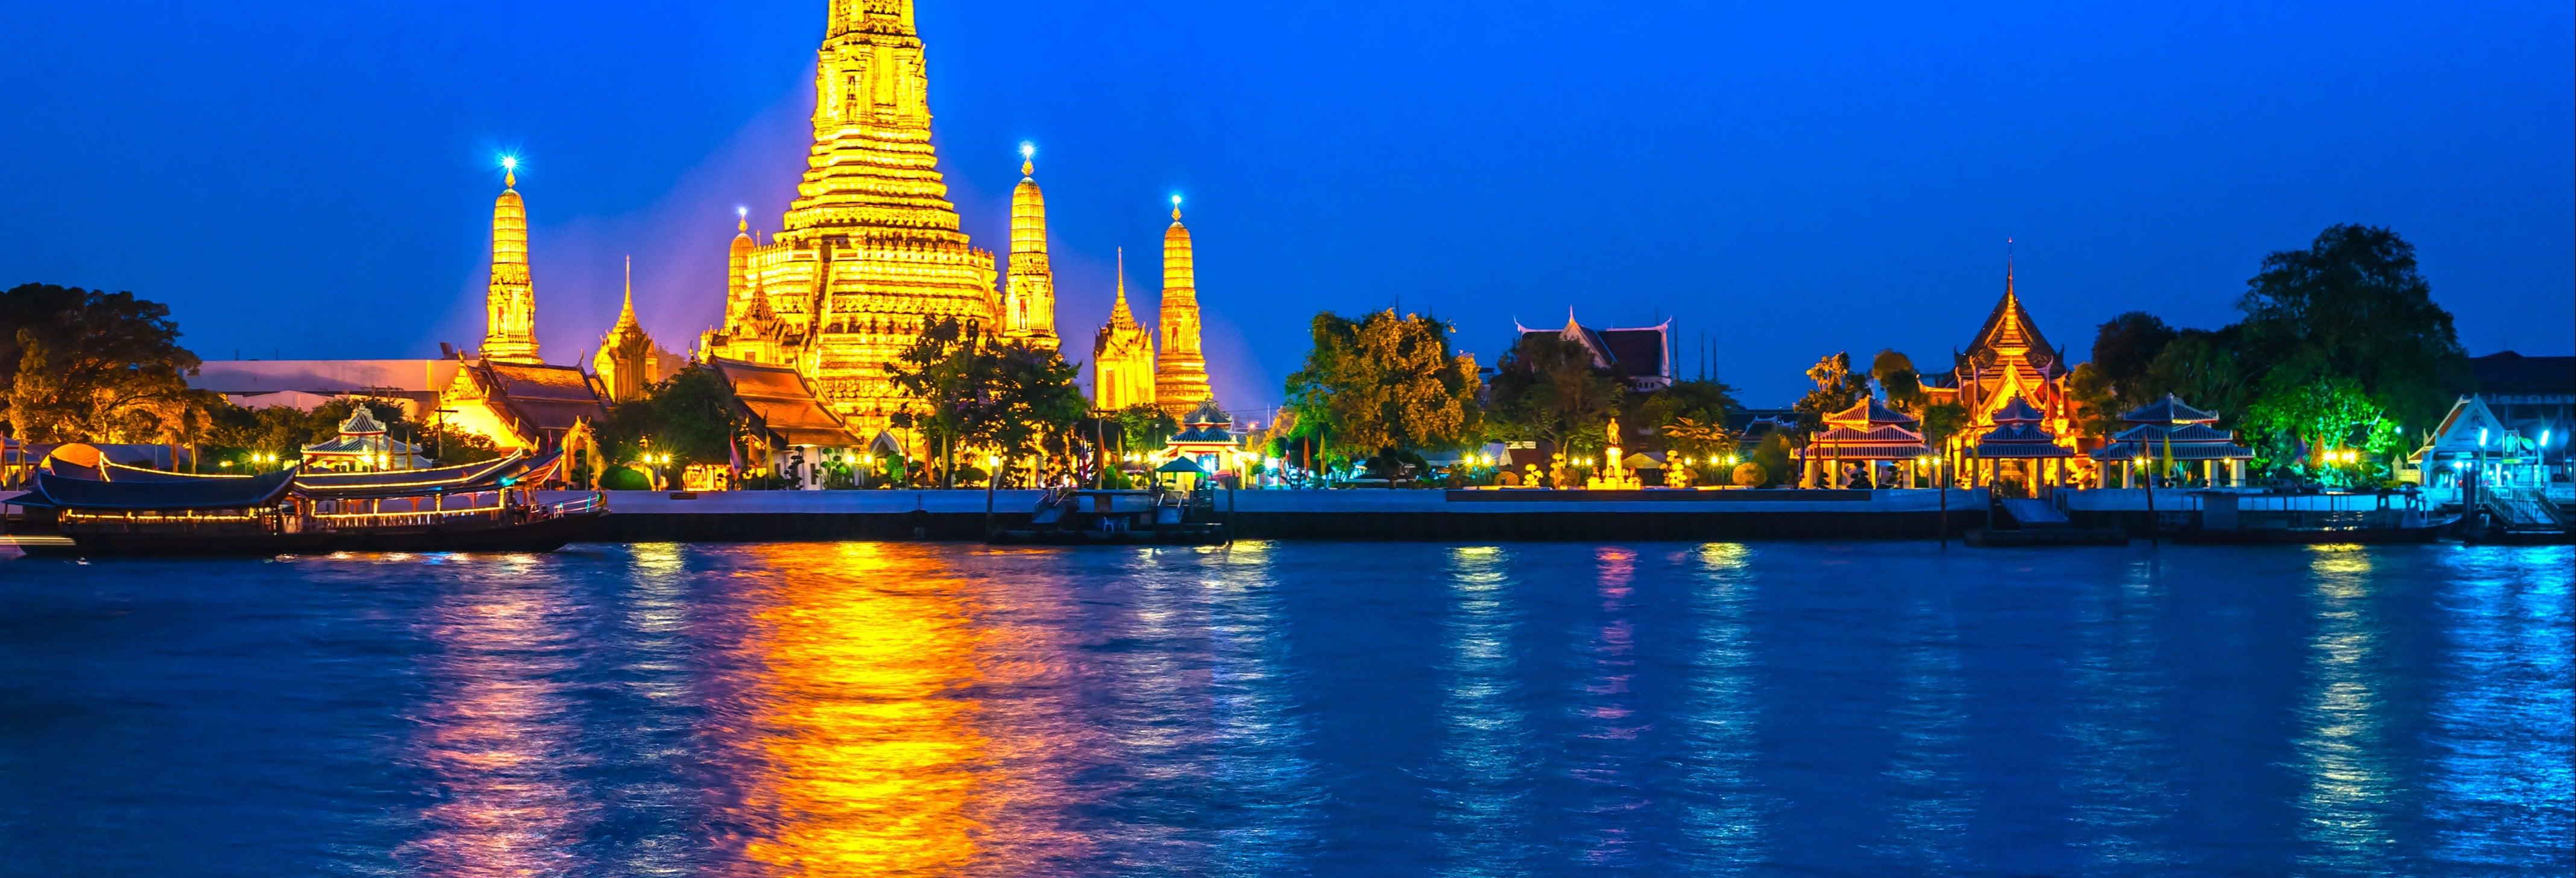 Visite de nuit dans Bangkok + Tour MahaNakhon